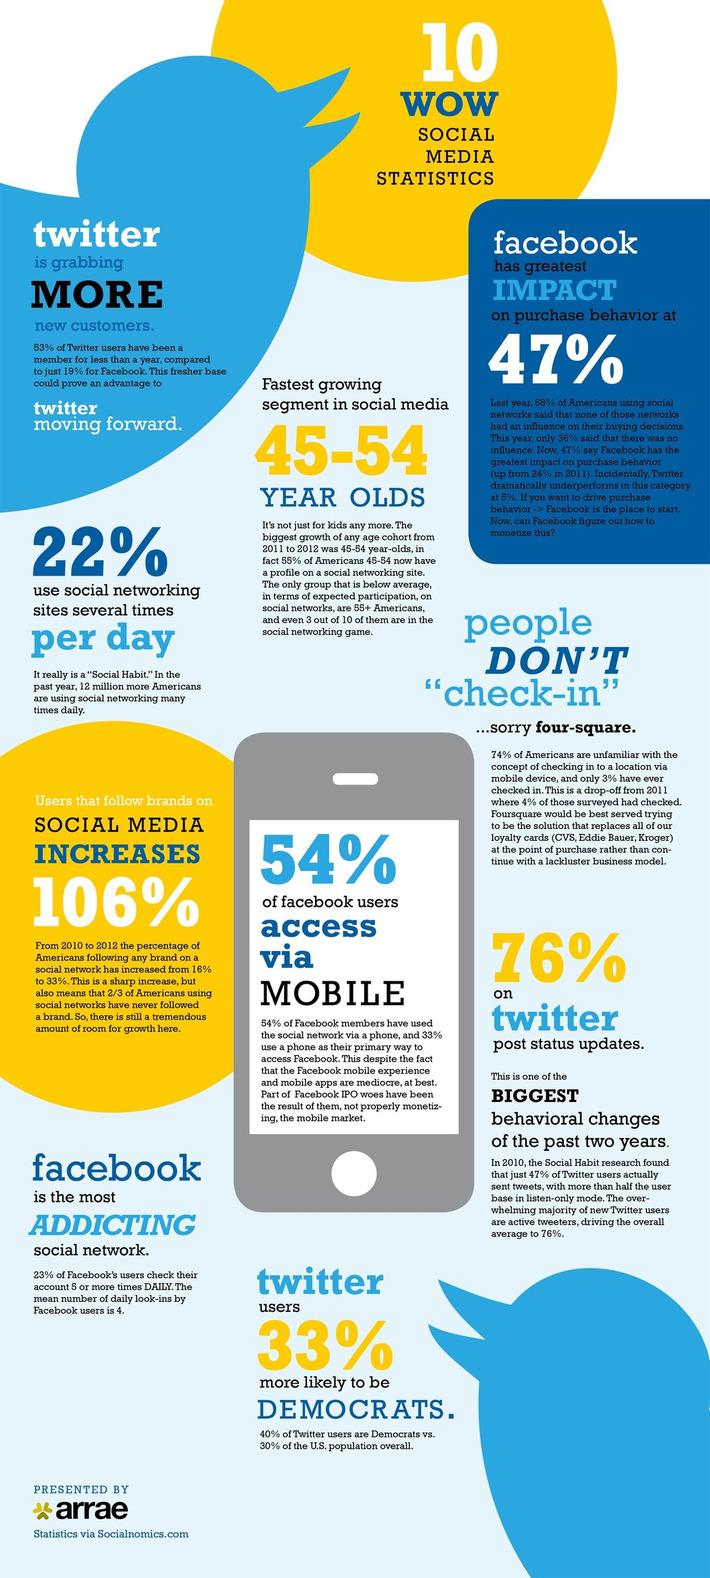 10 Amazing #SocialMedia Statistics [INFOGRAPHIC] | Collaborationweb | Scoop.it